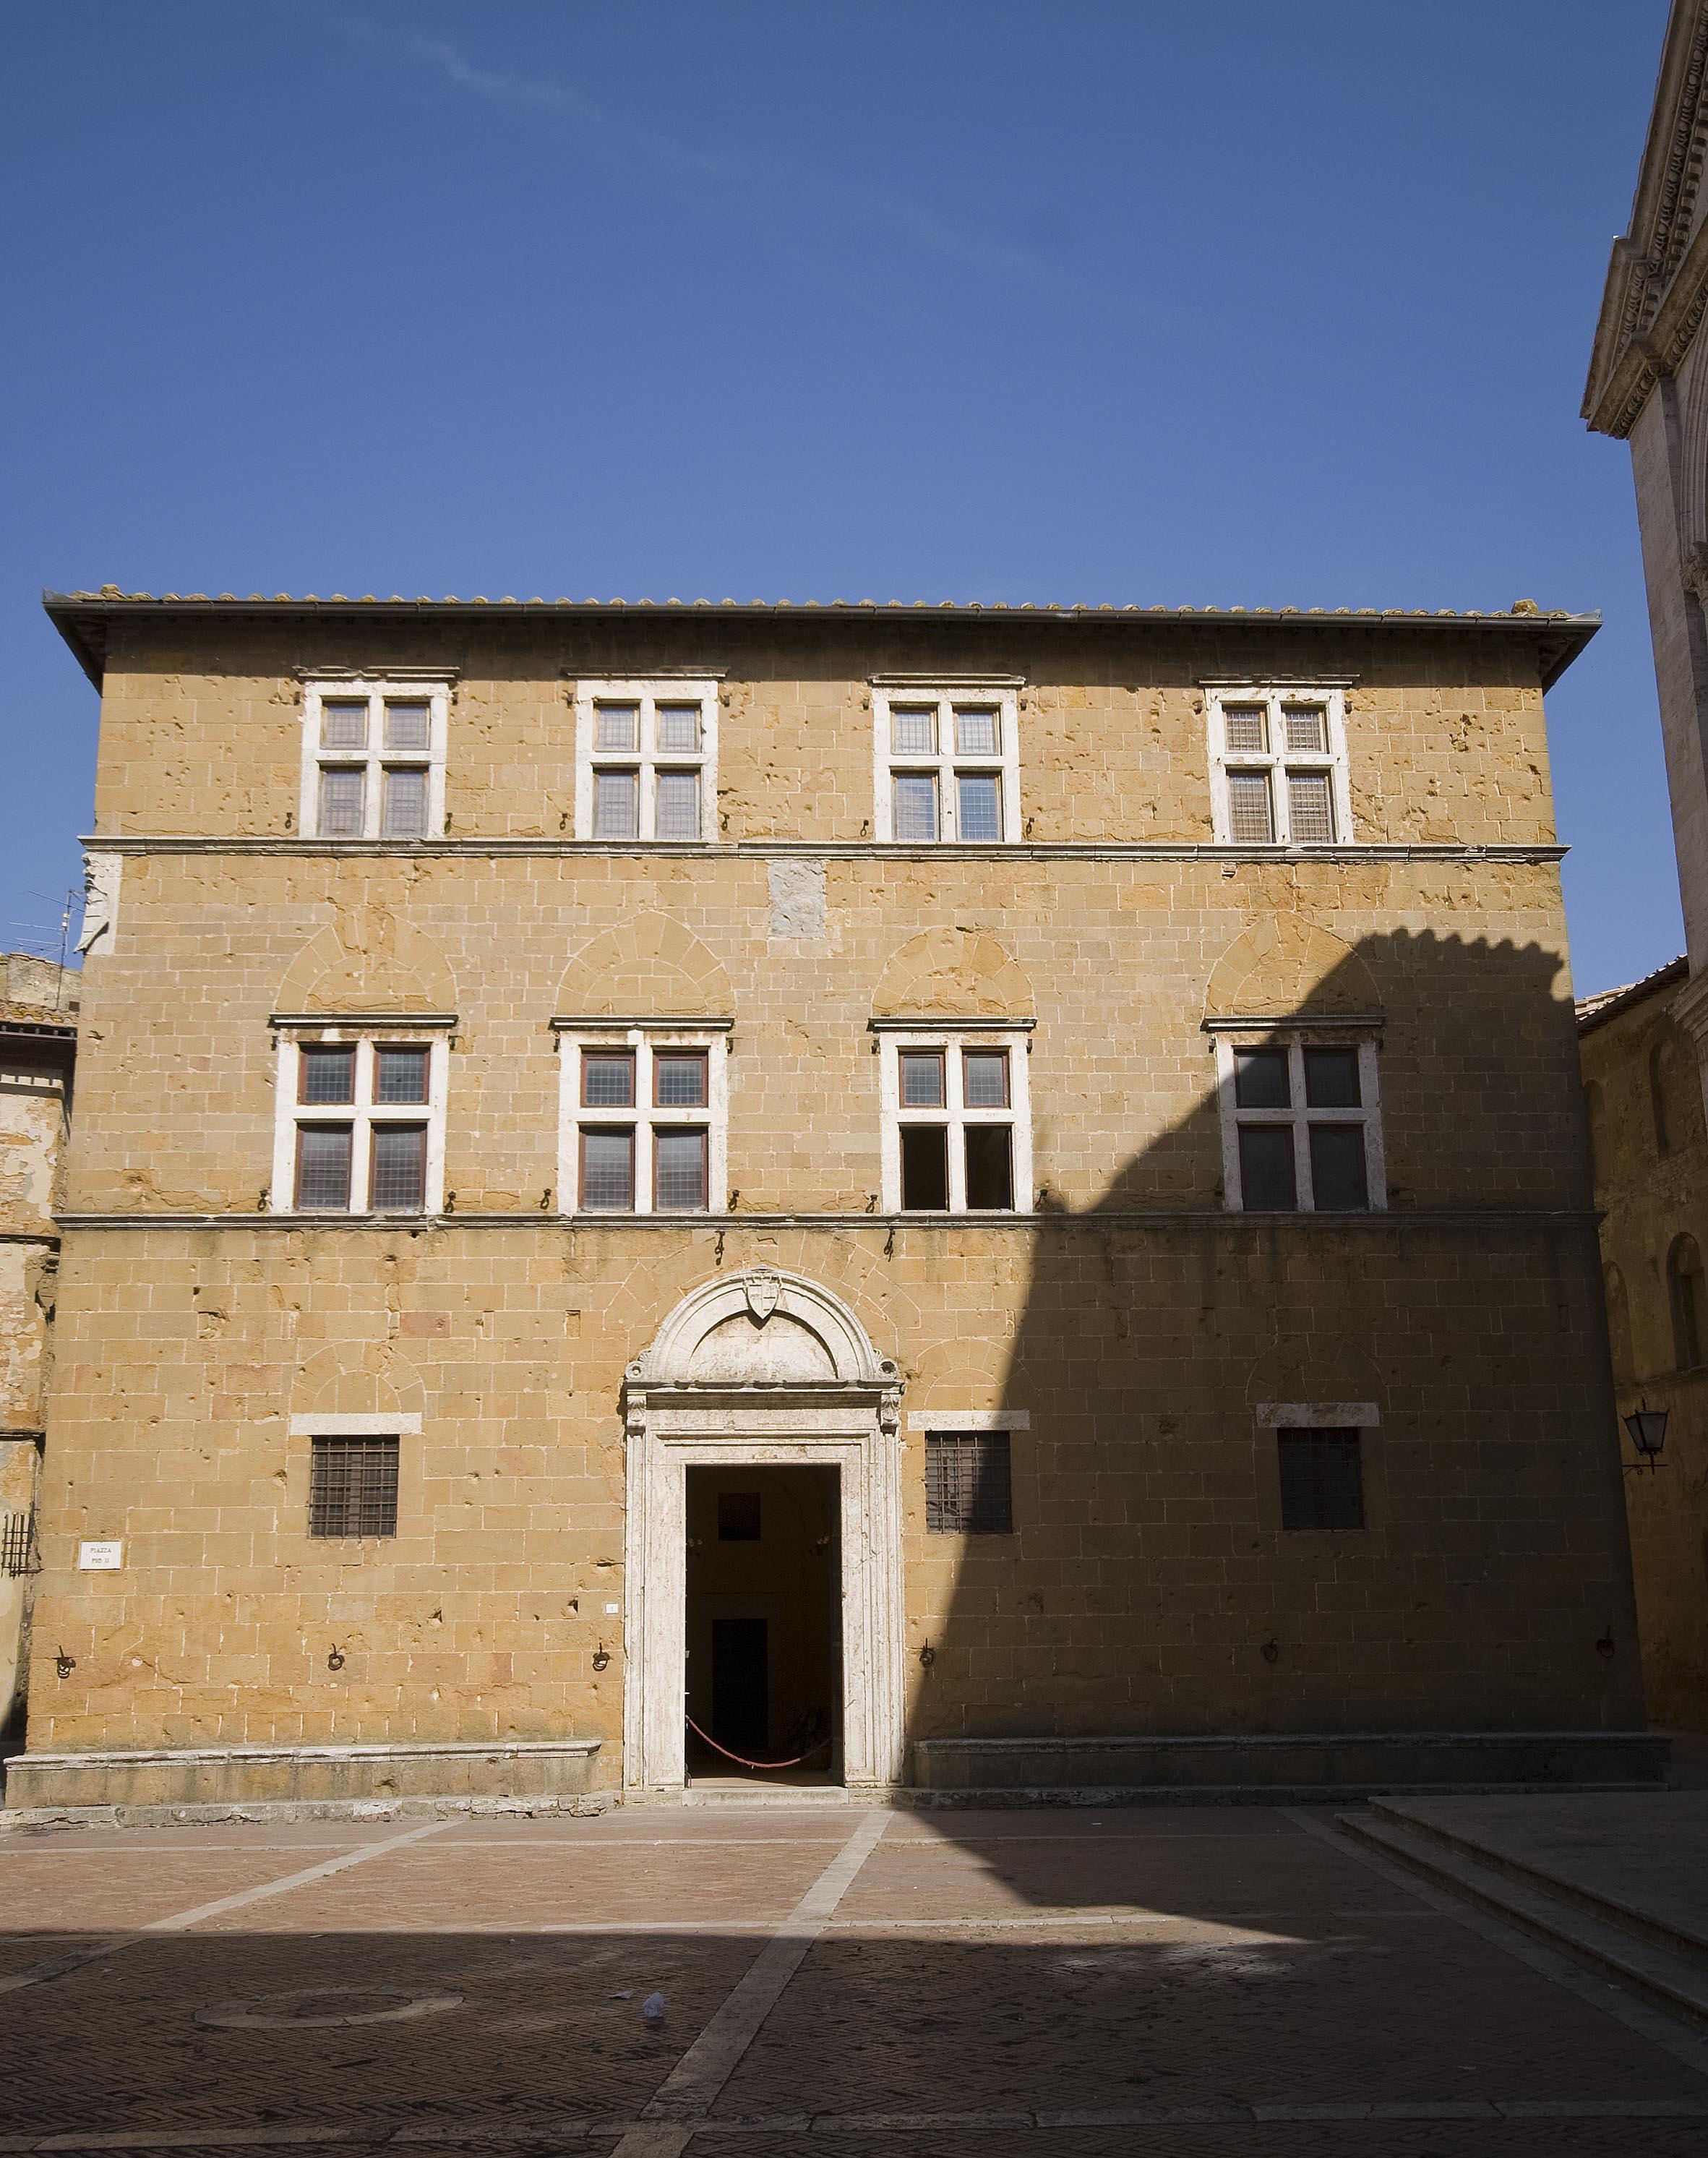 Palazzo borgia (Pienza).jpg